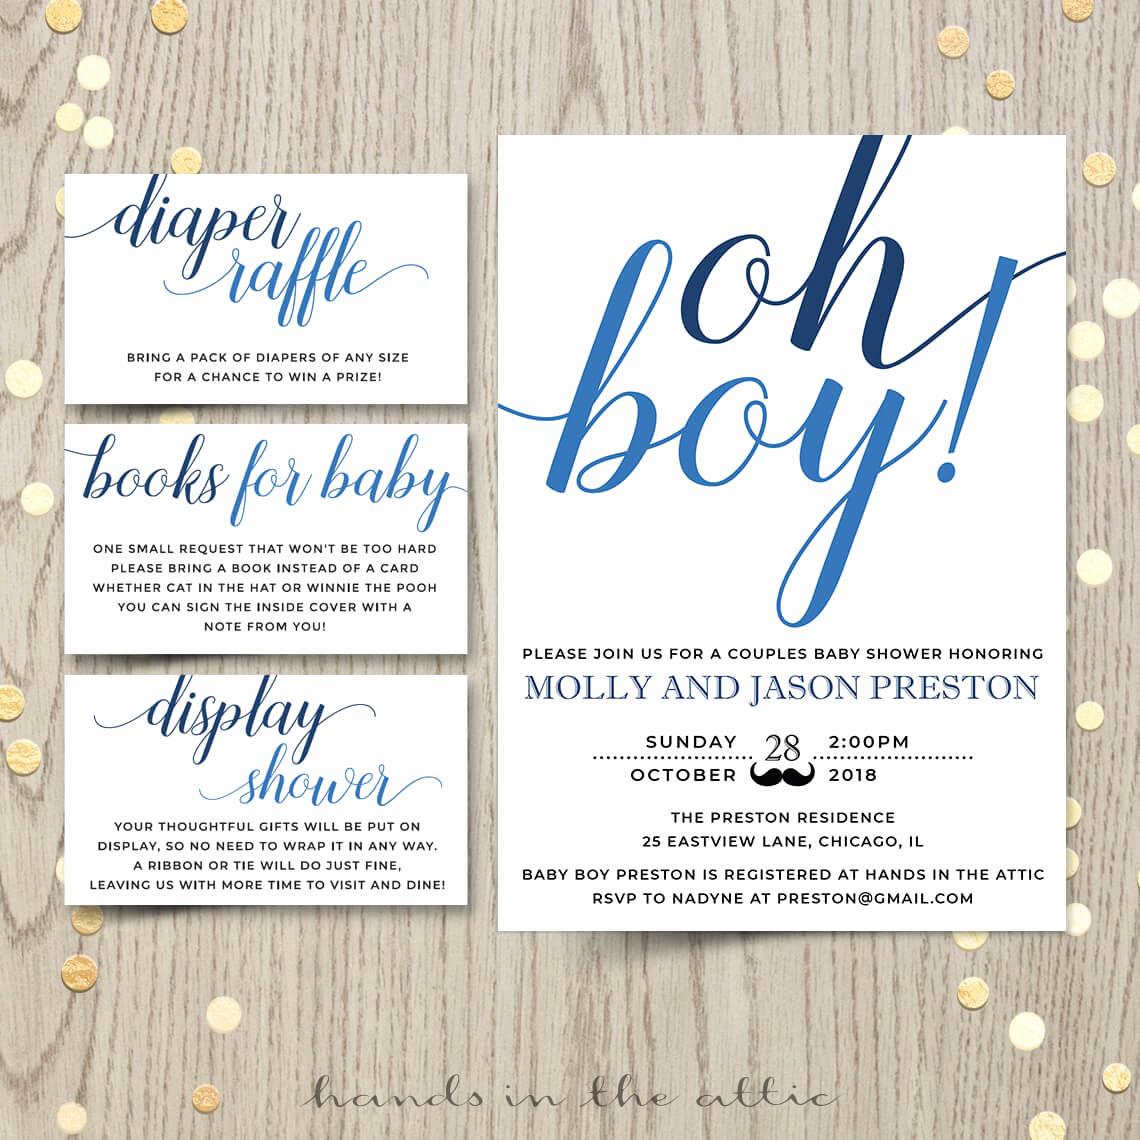 Baby Boy Shower Invitation Wording Inspirational Oh Boy Baby Shower Invitation